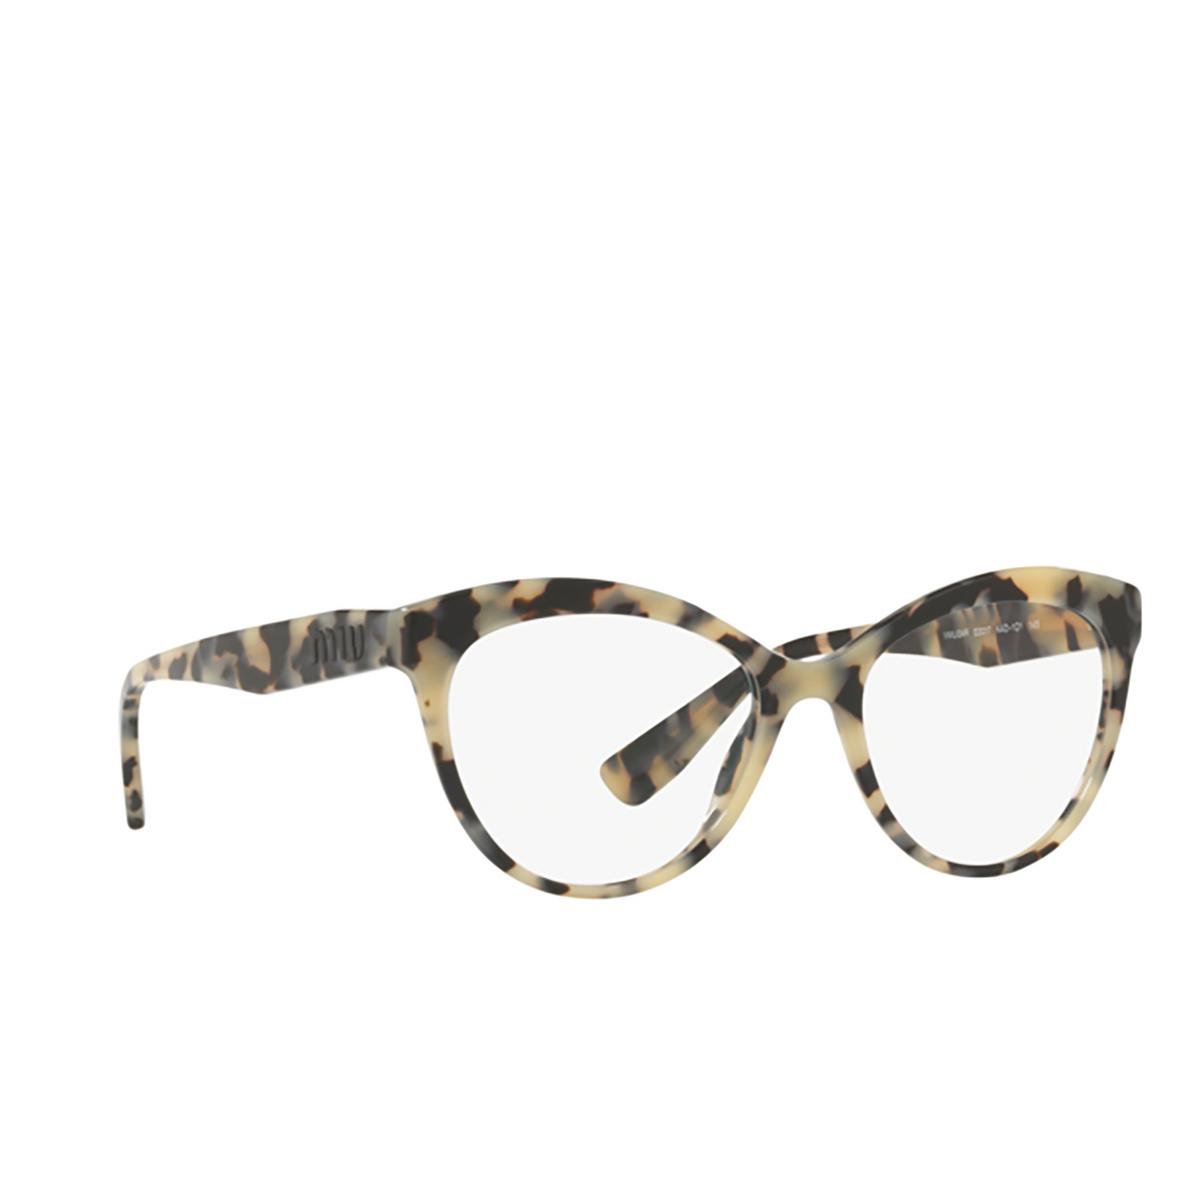 Miu Miu® Butterfly Eyeglasses: MU 04RV color Havana Sand Brown KAD1O1 - three-quarters view.